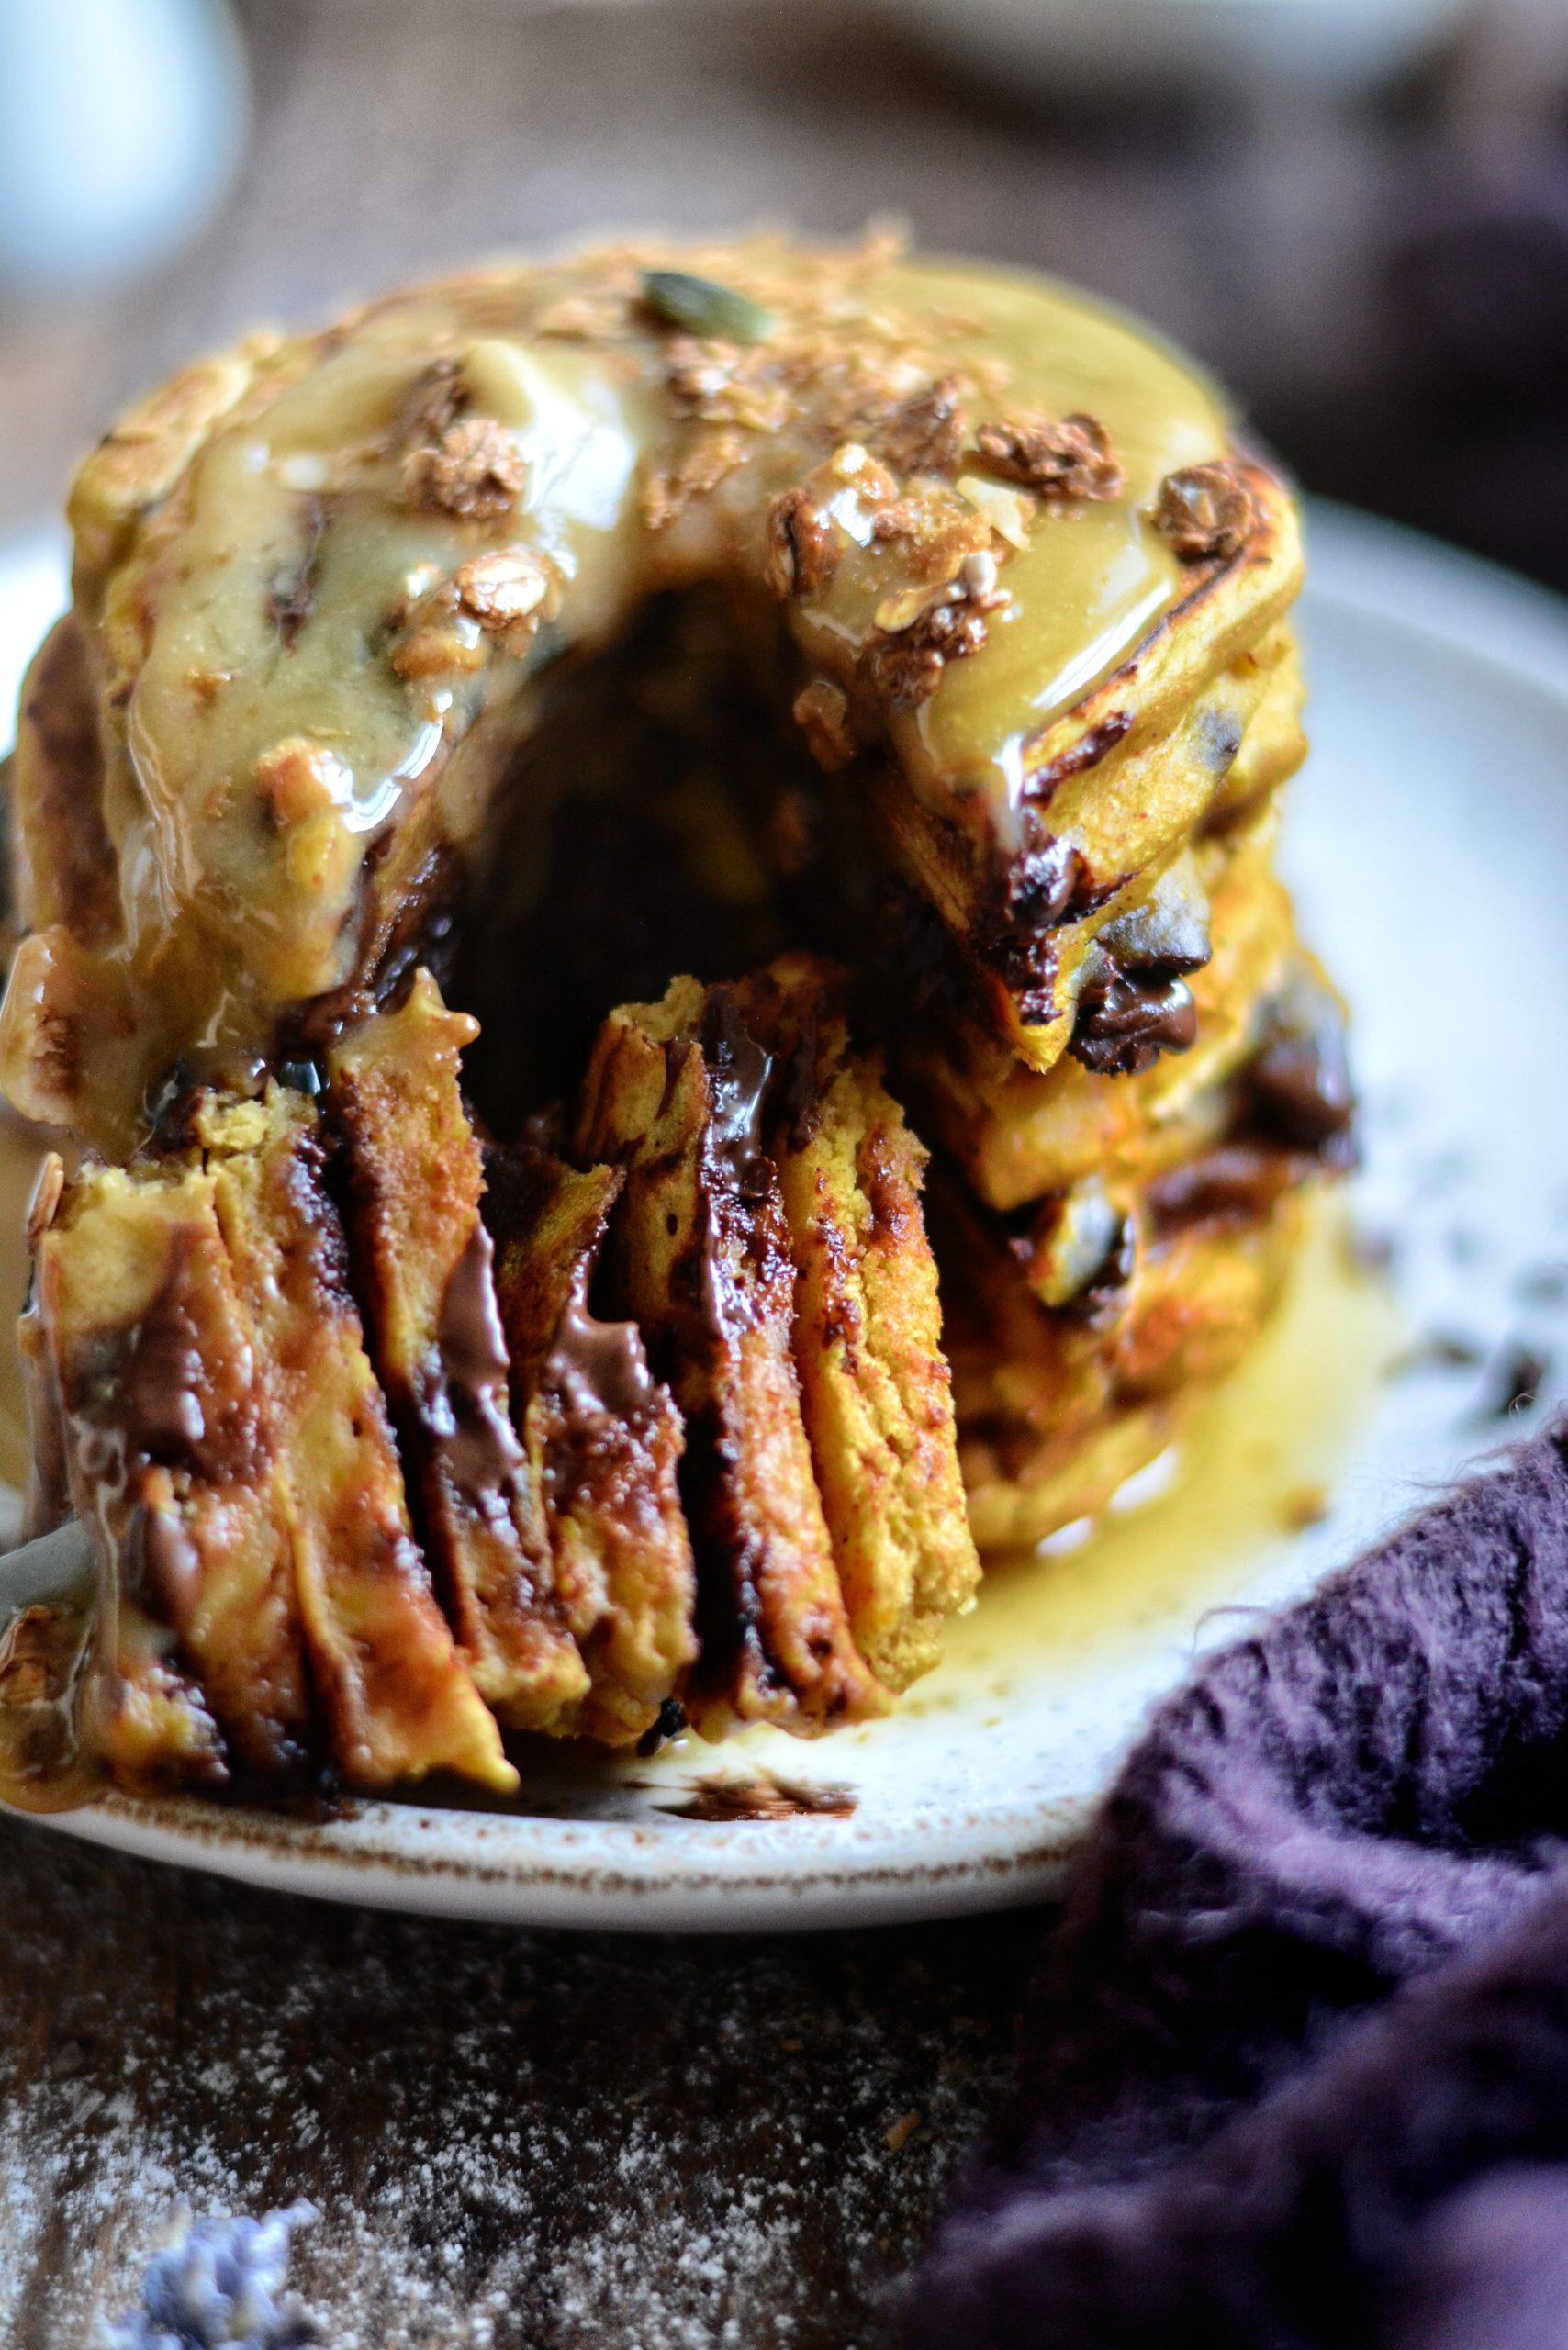 Pancakes Vegan Potiron, Caramel au Sirop d'Erable / Vegan Pumpkin Pancakes and Maple Syrup Caramel